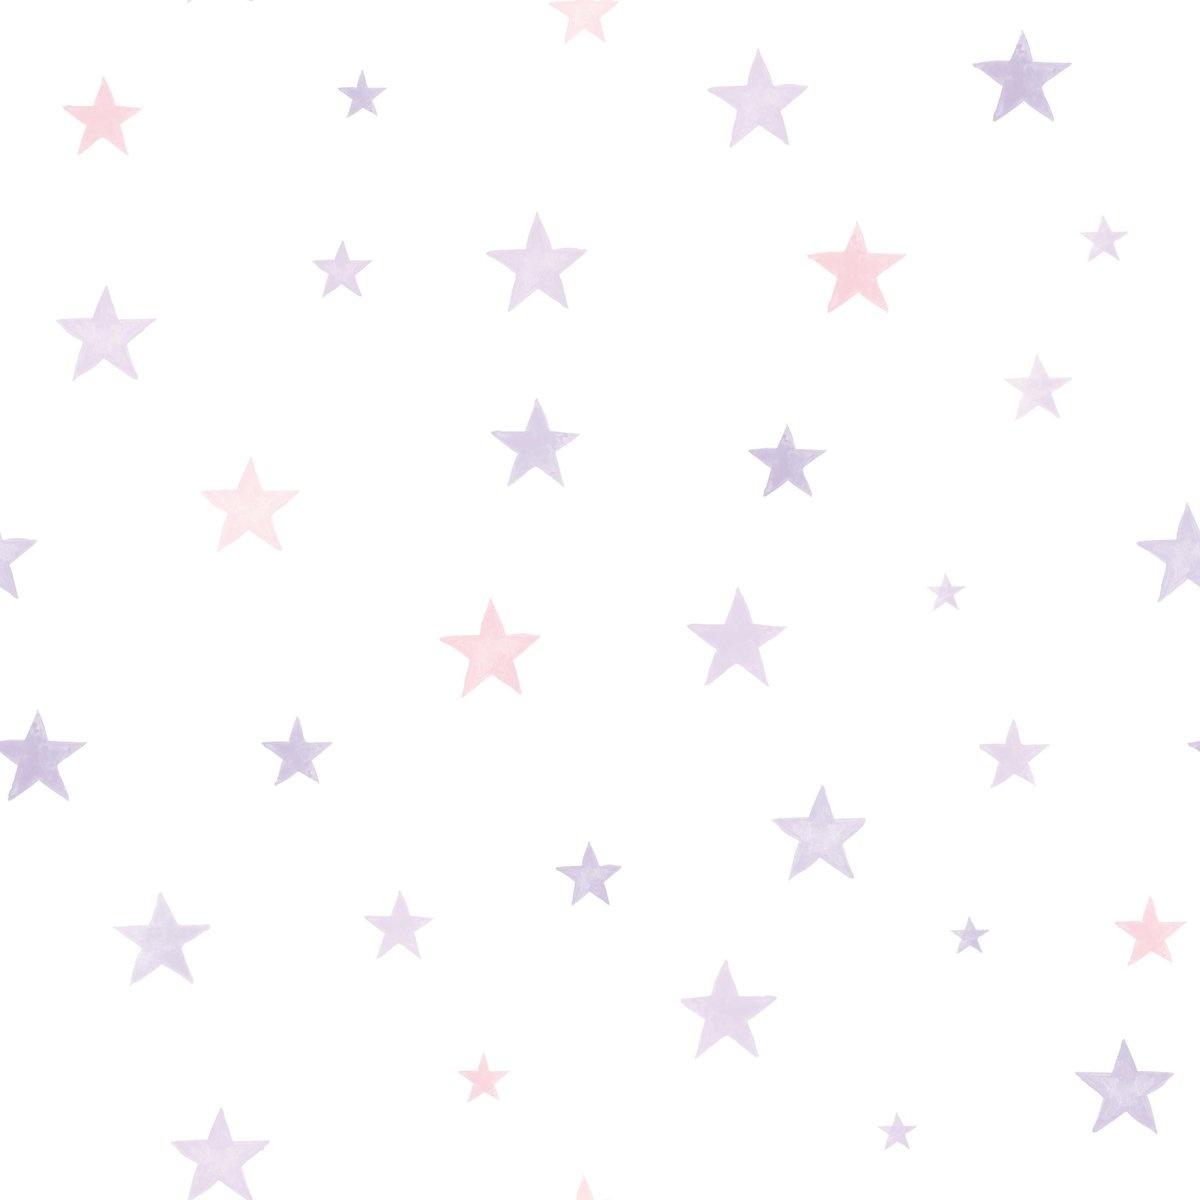 Little Ones Sterren roze/lila Behang